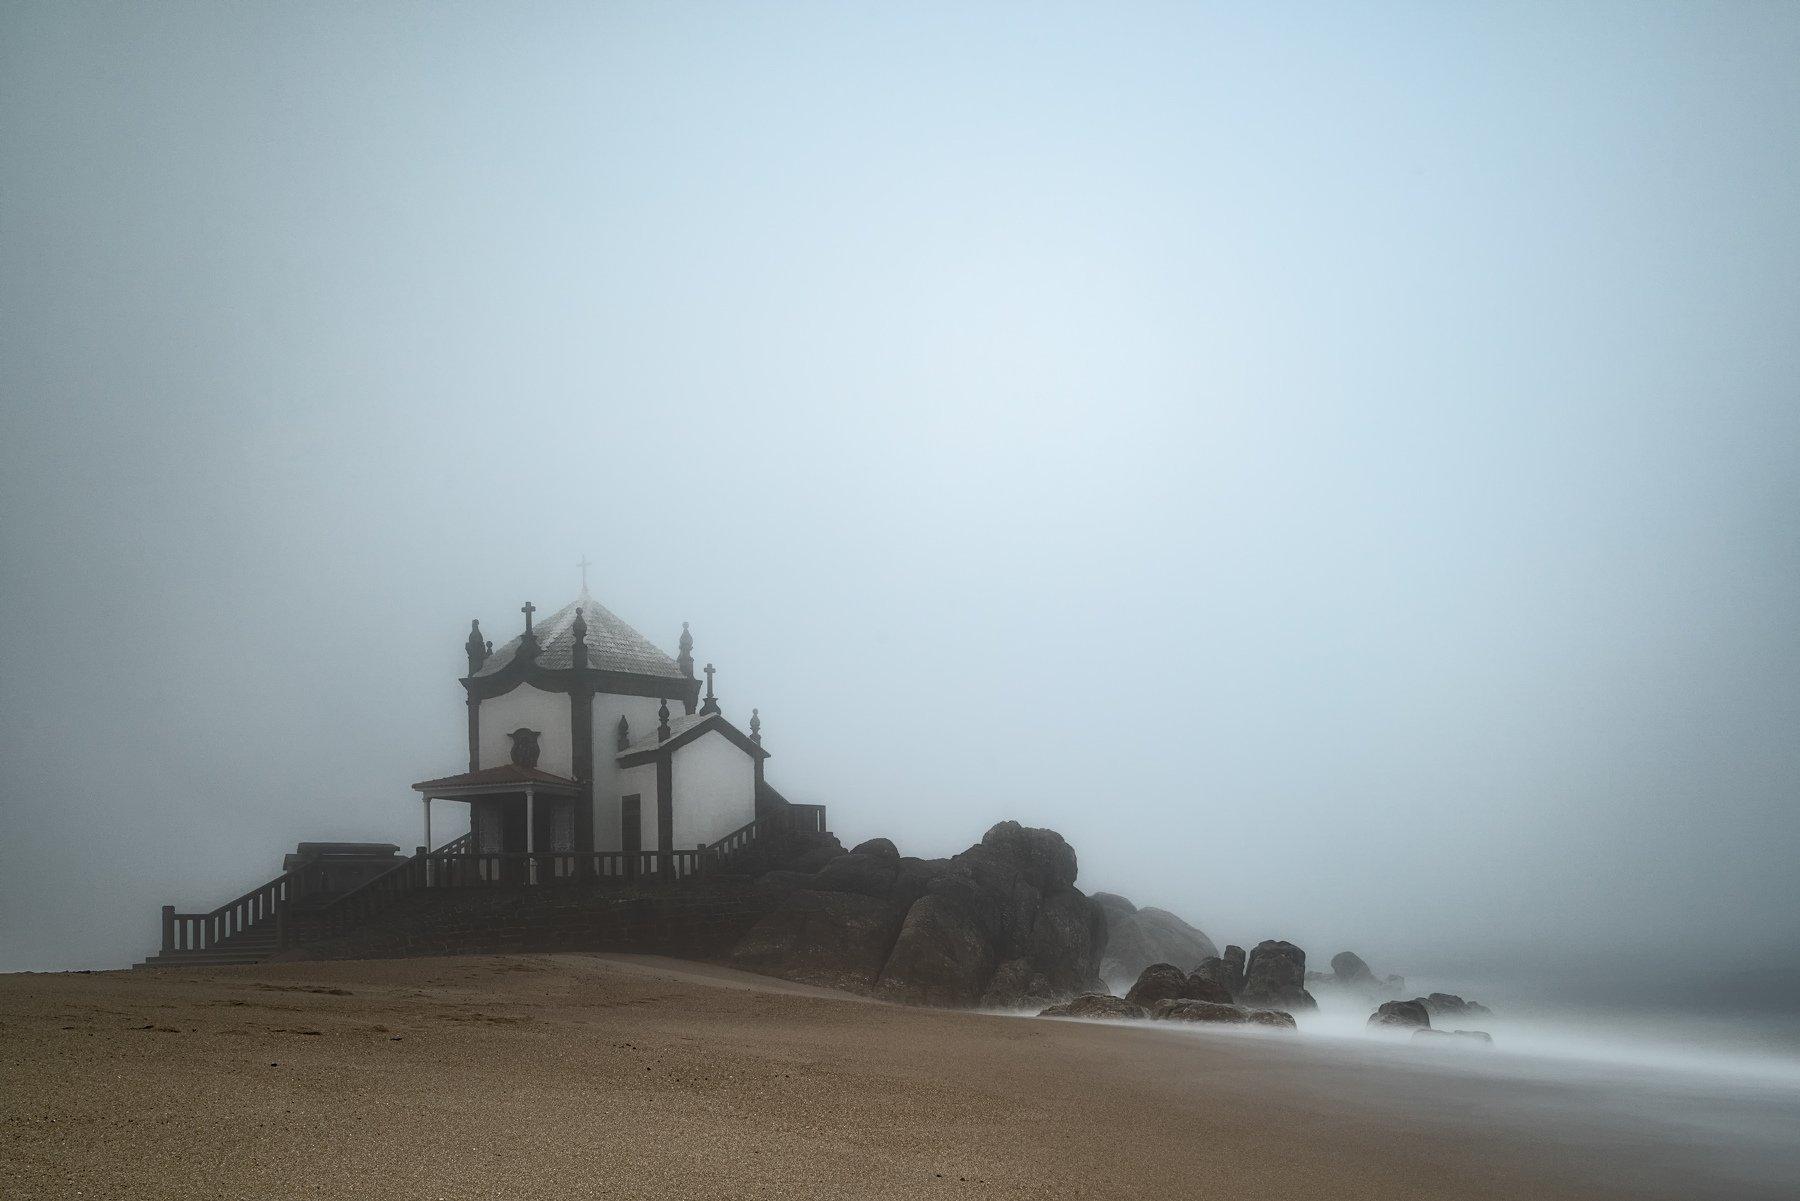 portugal,kapele,mist,morning,minimalismus,long exposure,travel,photo hunter, Felix Ostapenko